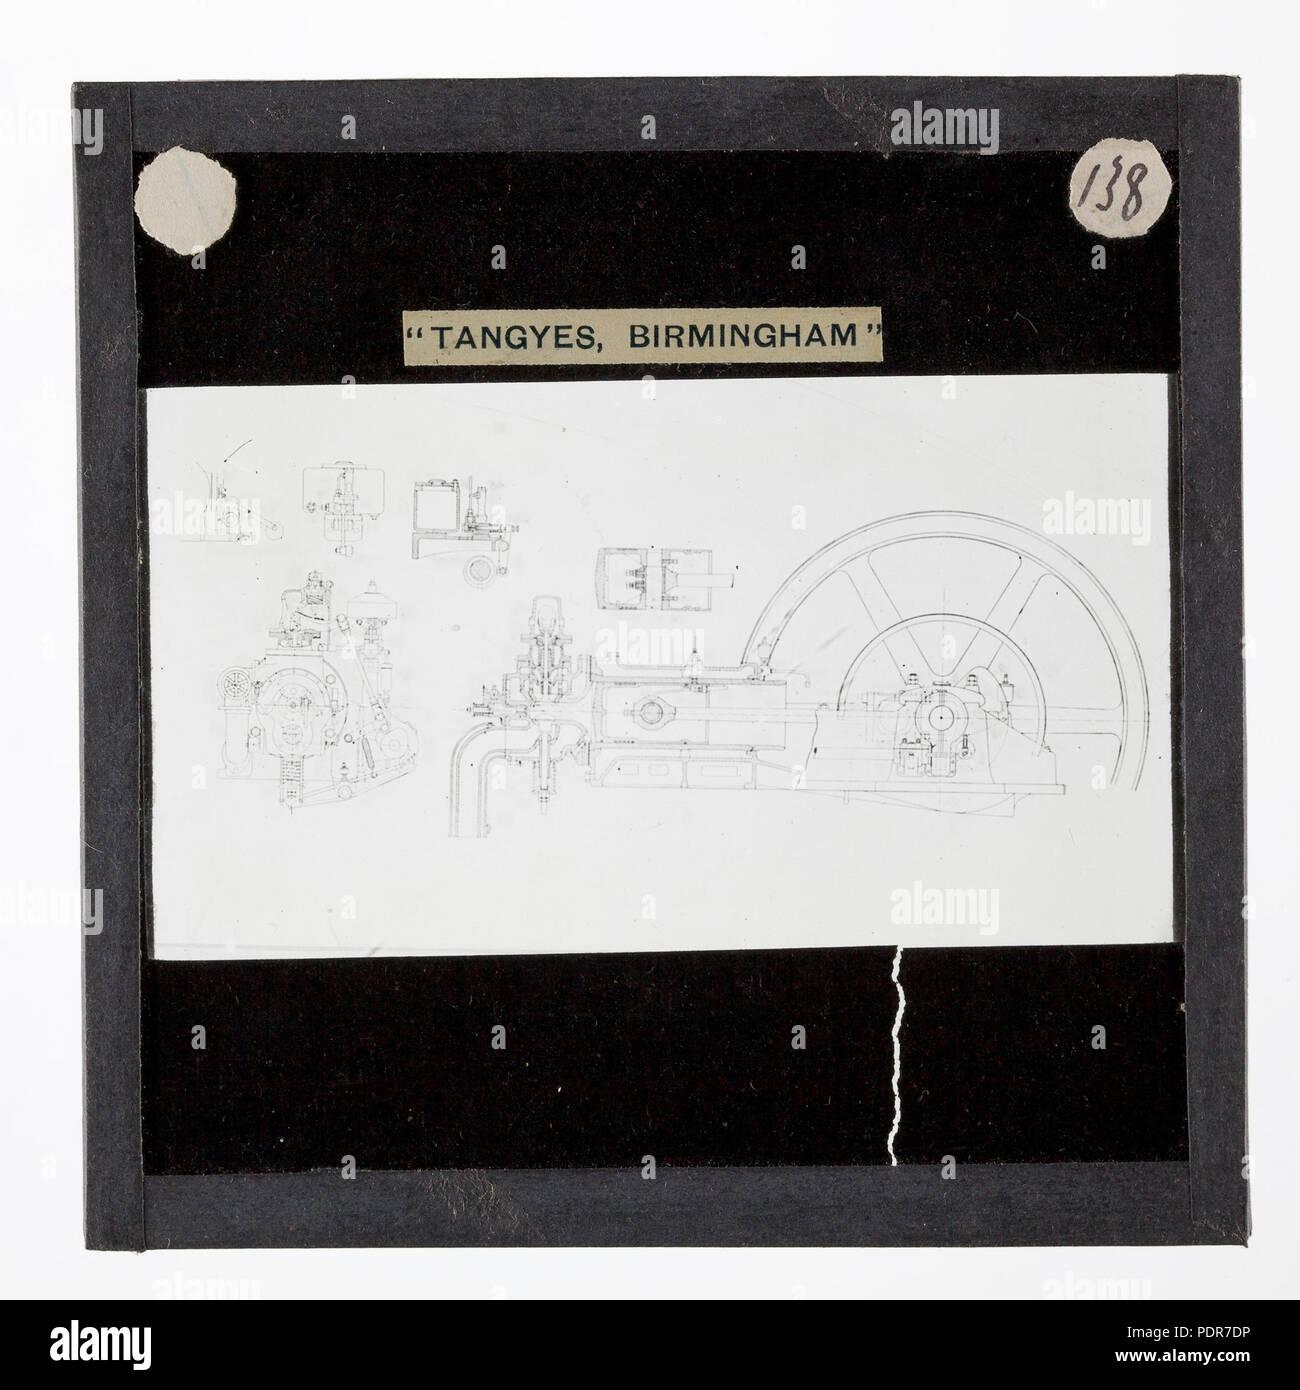 77 lantern slide - tangyes ltd, gas engine diagram, circa 1910